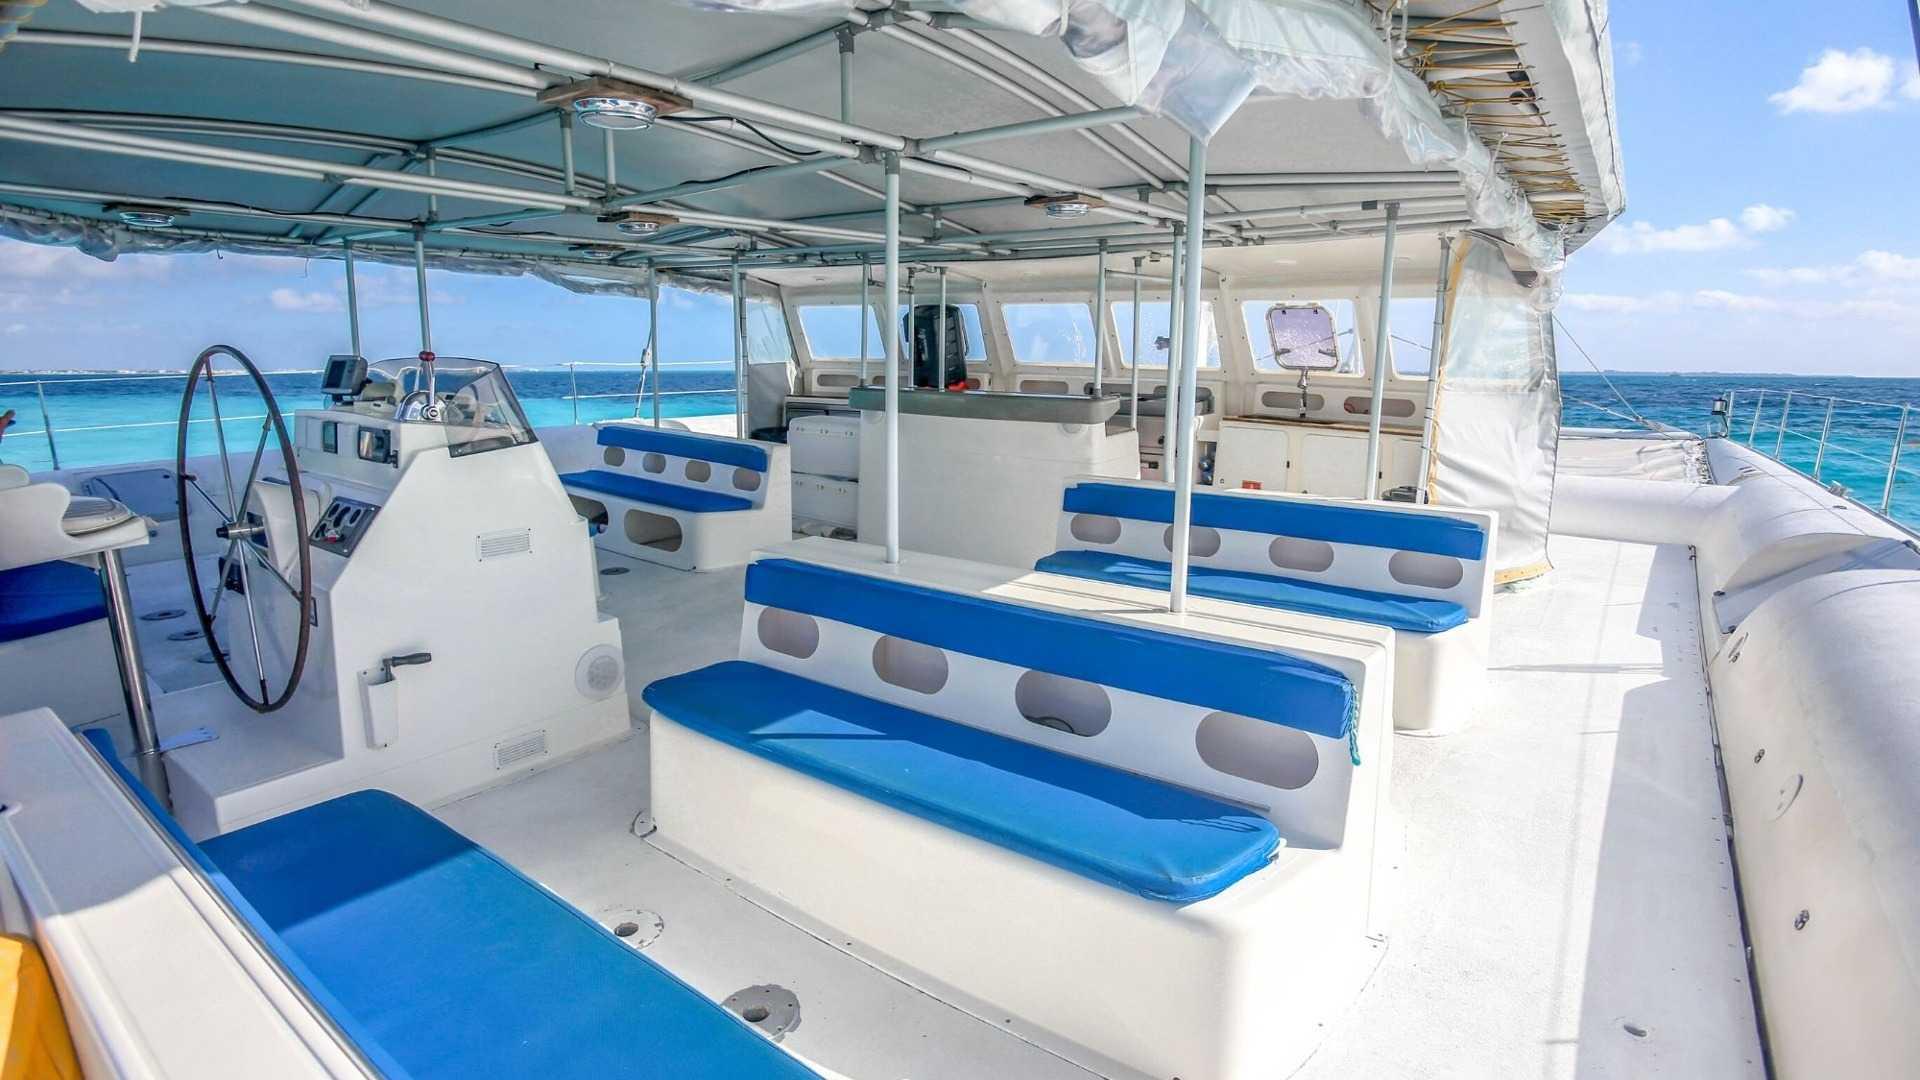 2 - LowRes - Sea Passion III - Isla Mujeres Catamaran Tour - Cancun Sailing